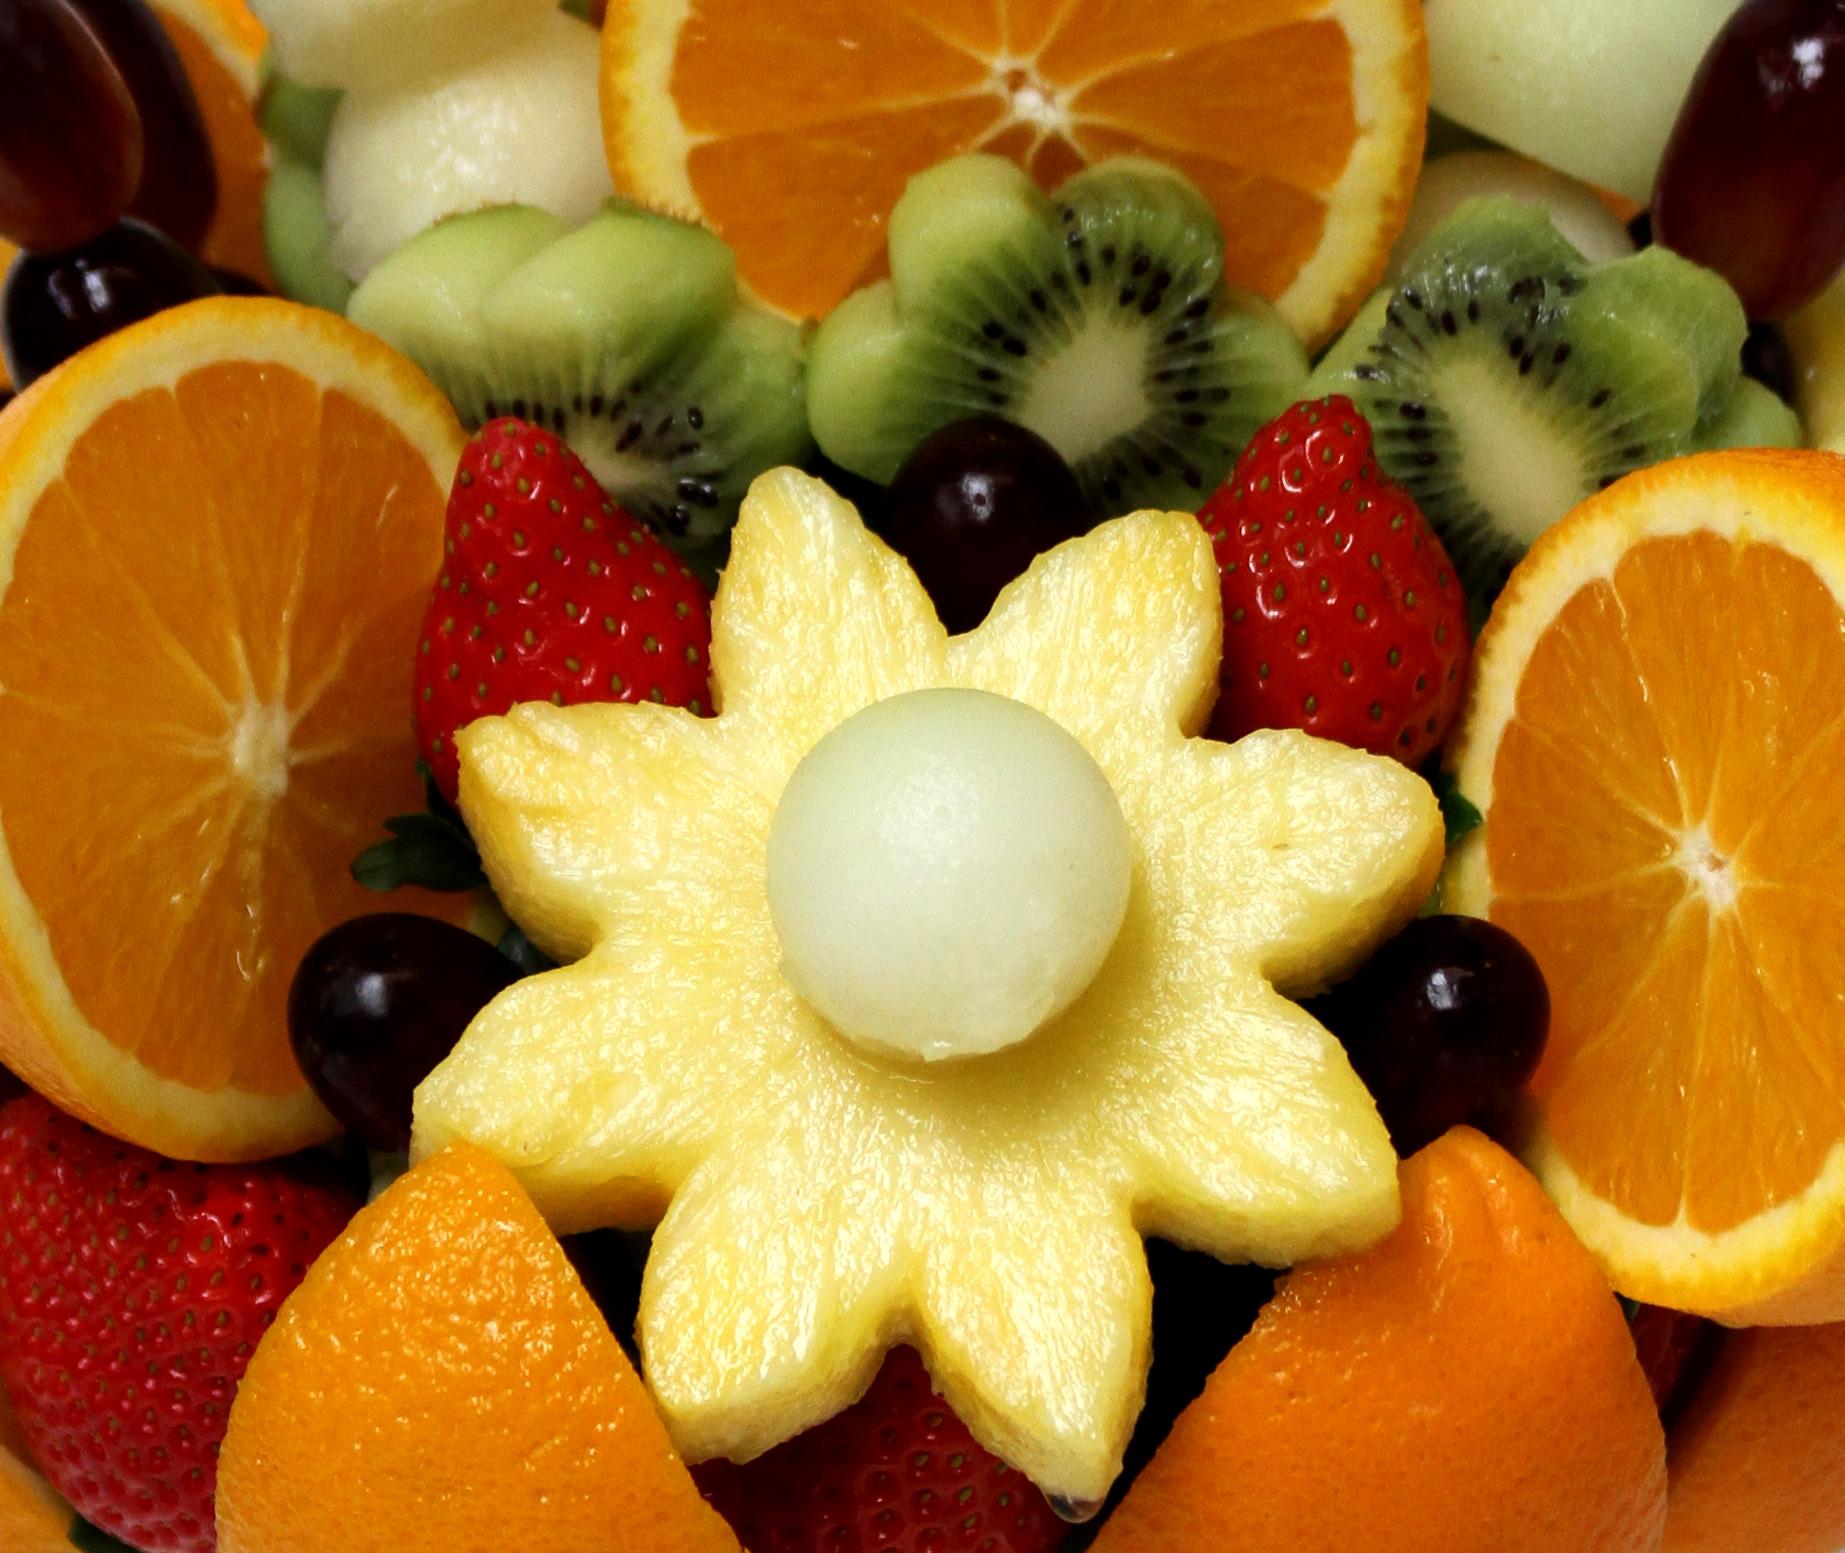 Pineapple star